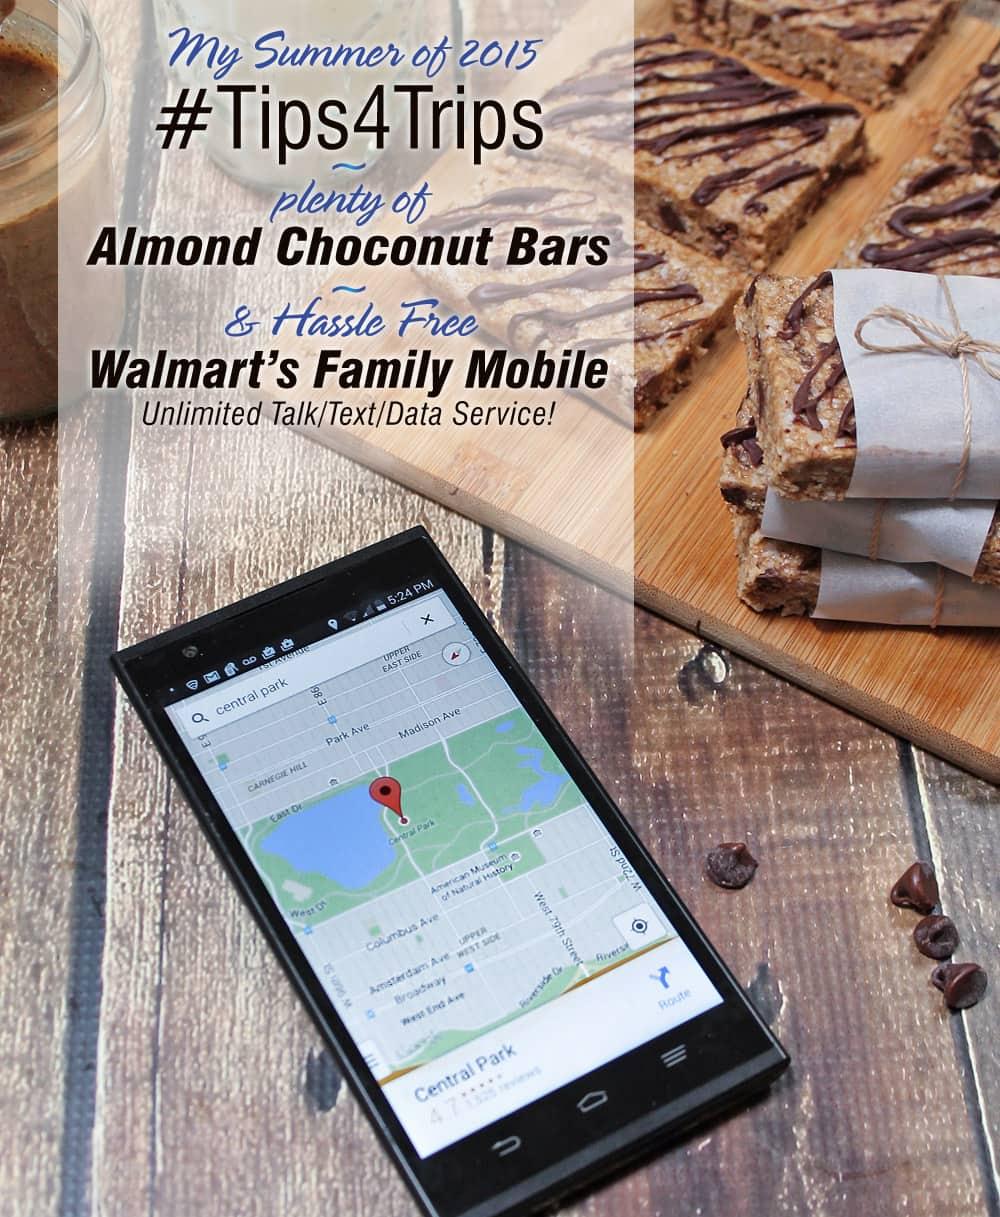 Walmart Family Mobile ZTE ZMAX #TIPS4TRIPS